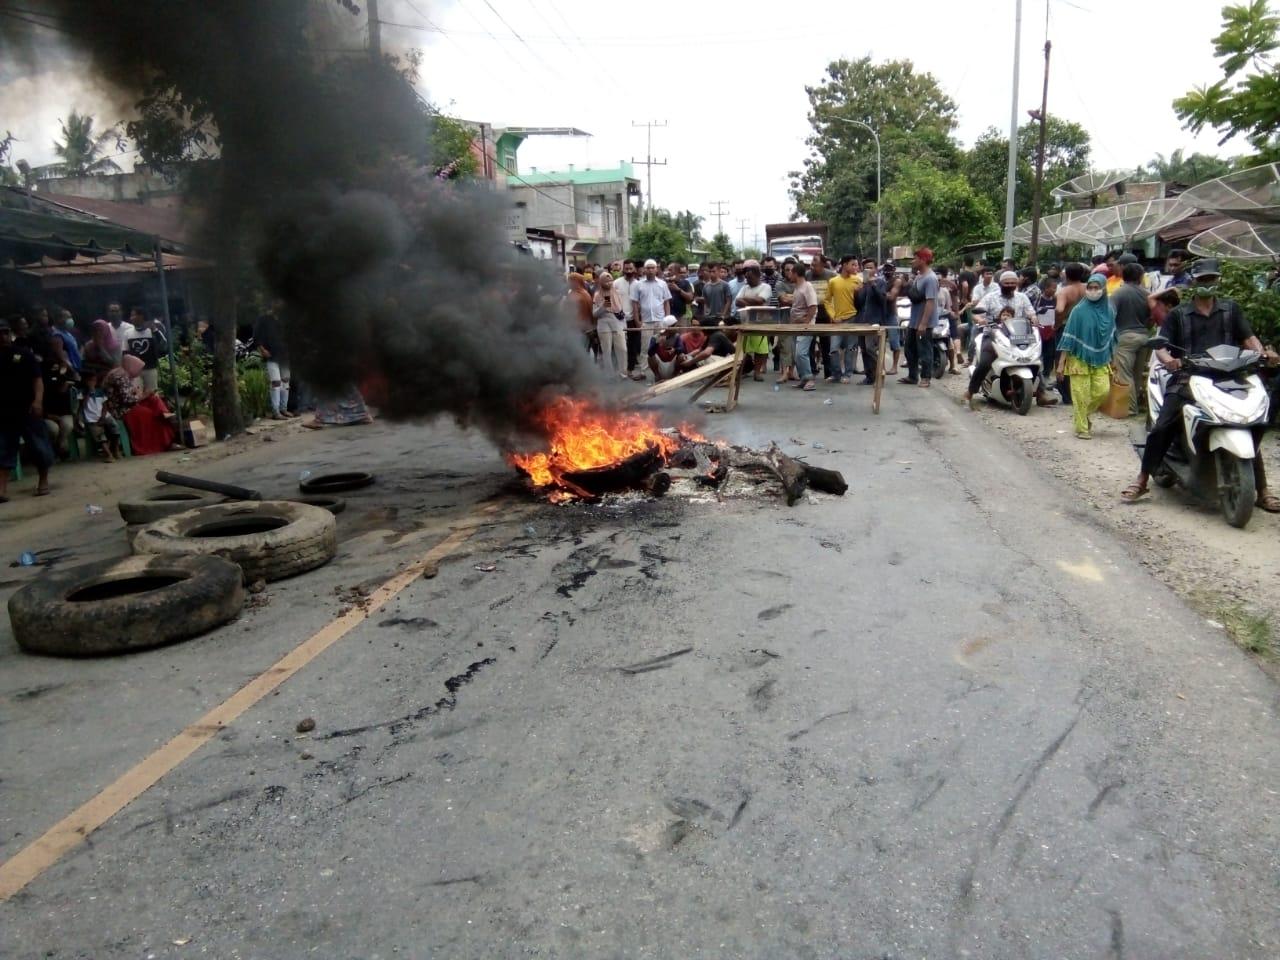 Tersangka Pelaku Penembakan Personel Polisi Meninggal. Warga Blokir Jalinsum Gunting Saga